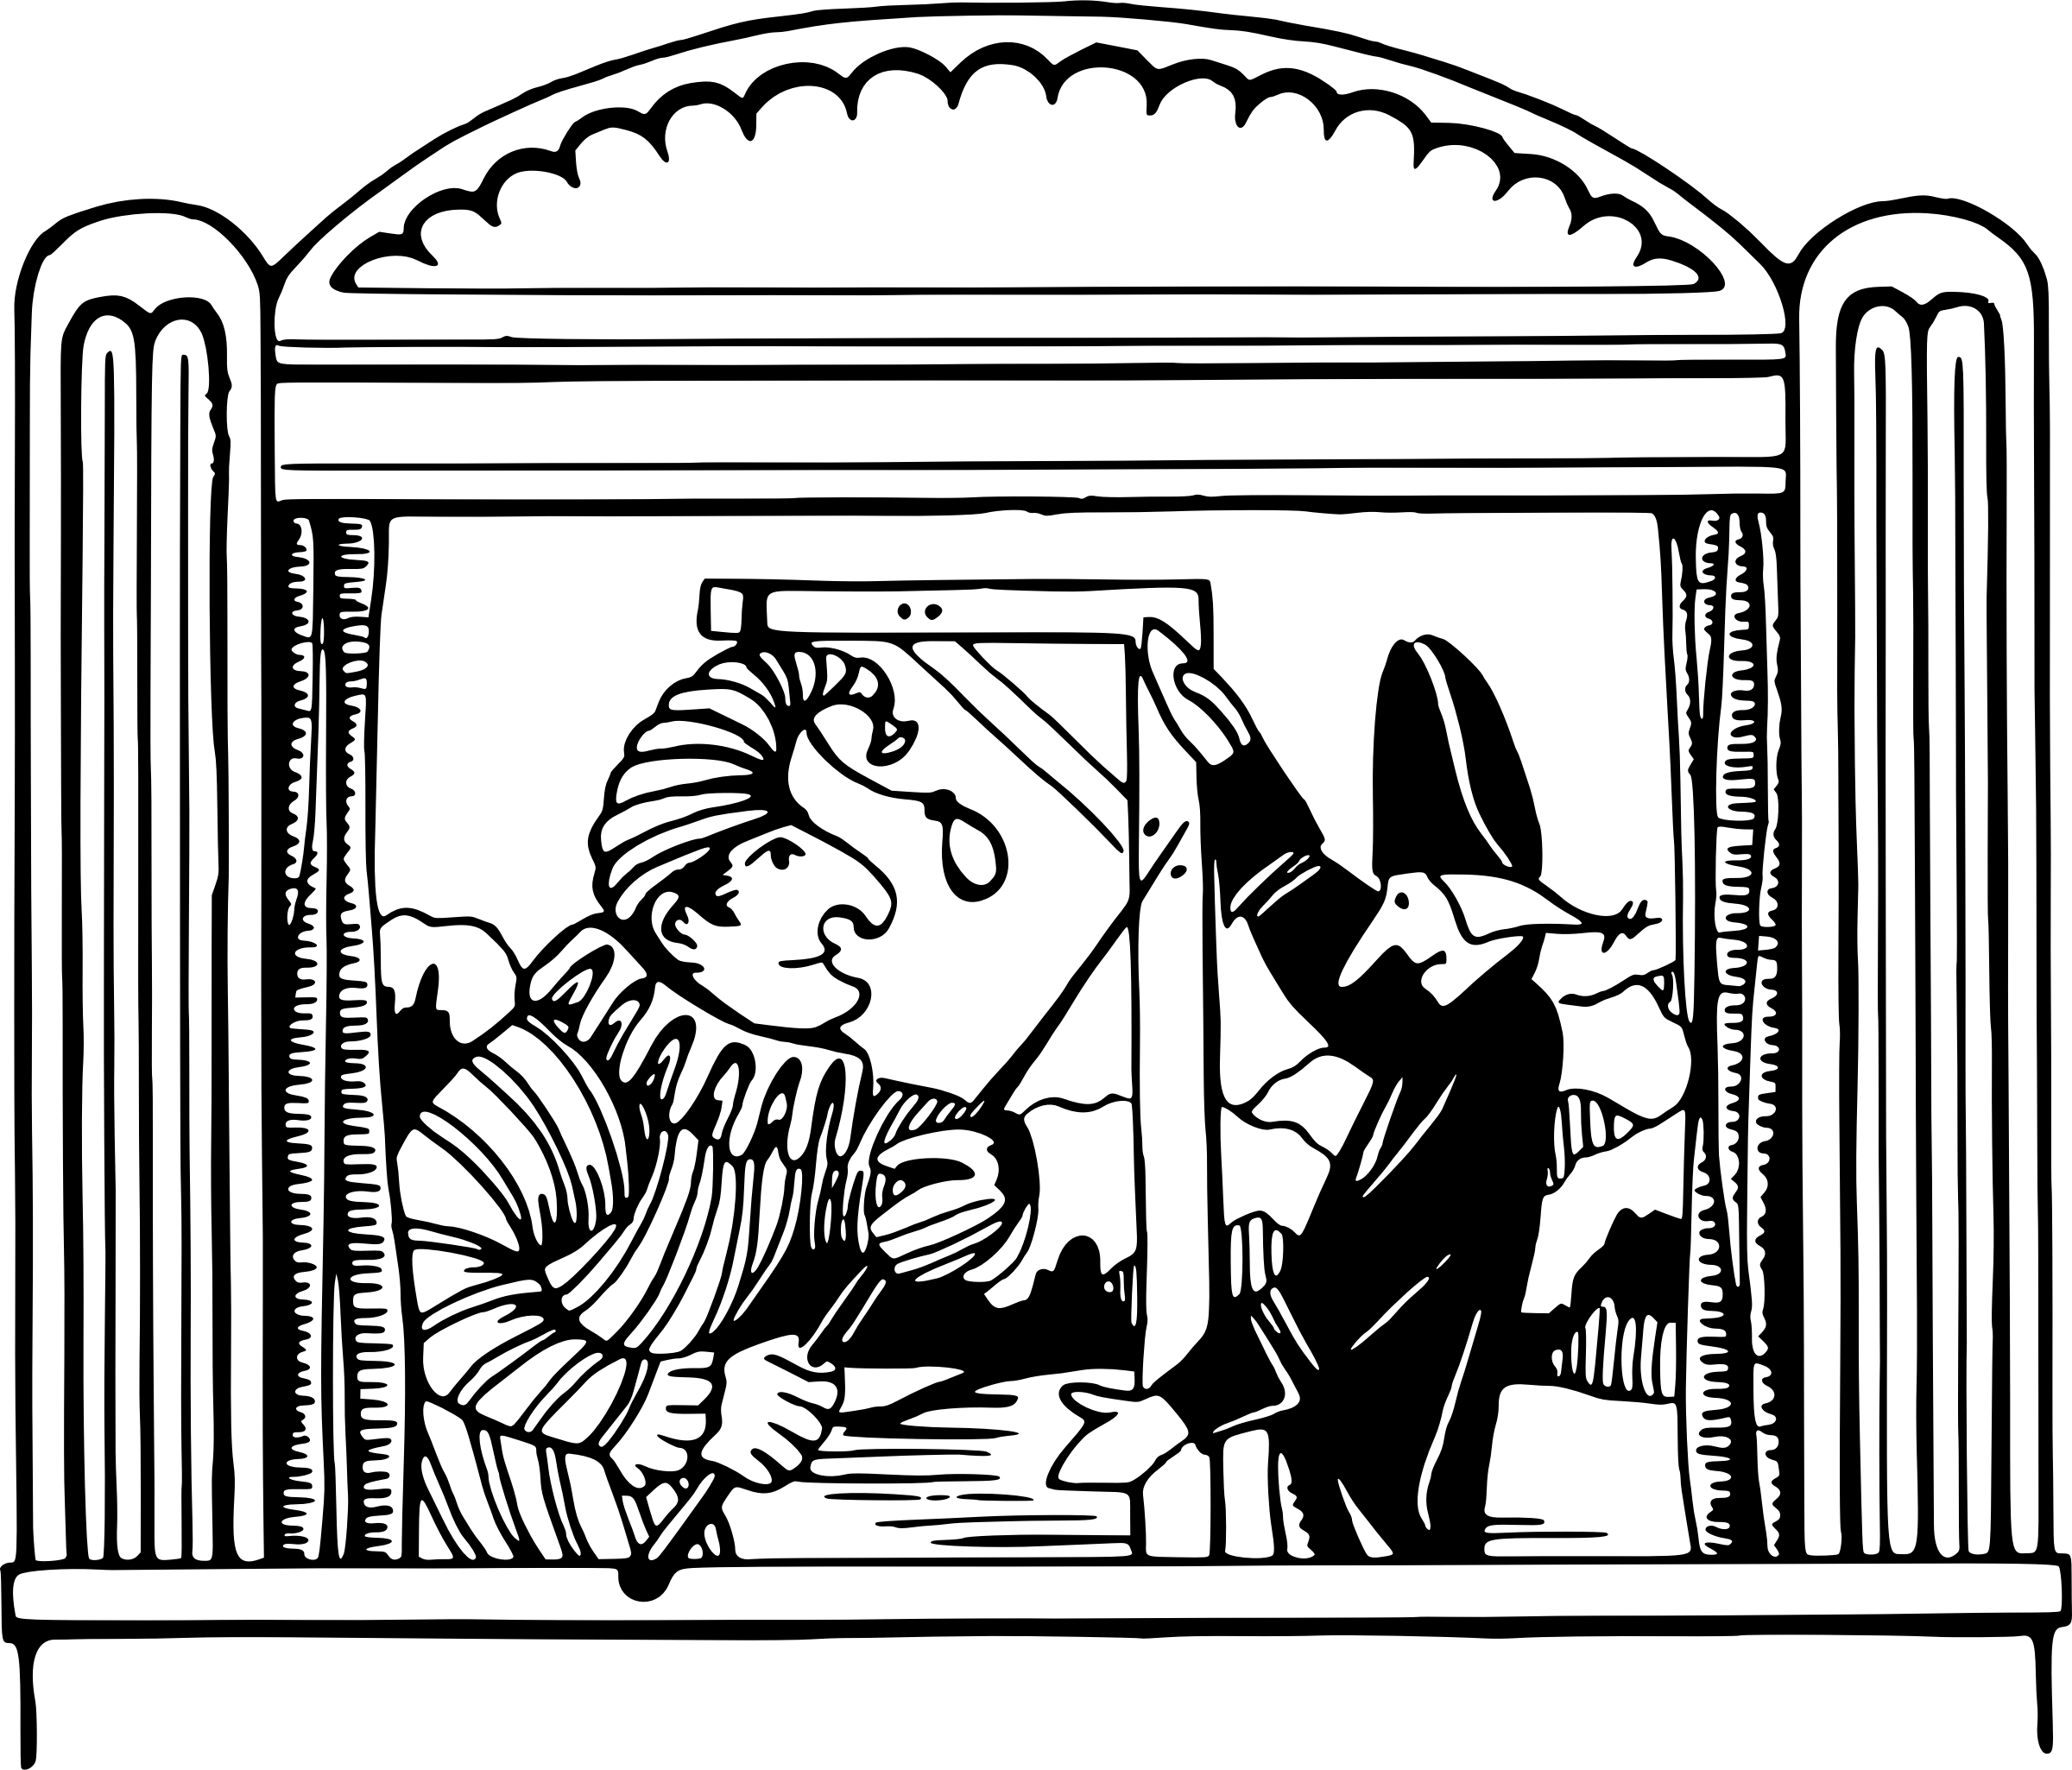 2400x2050 Clipart